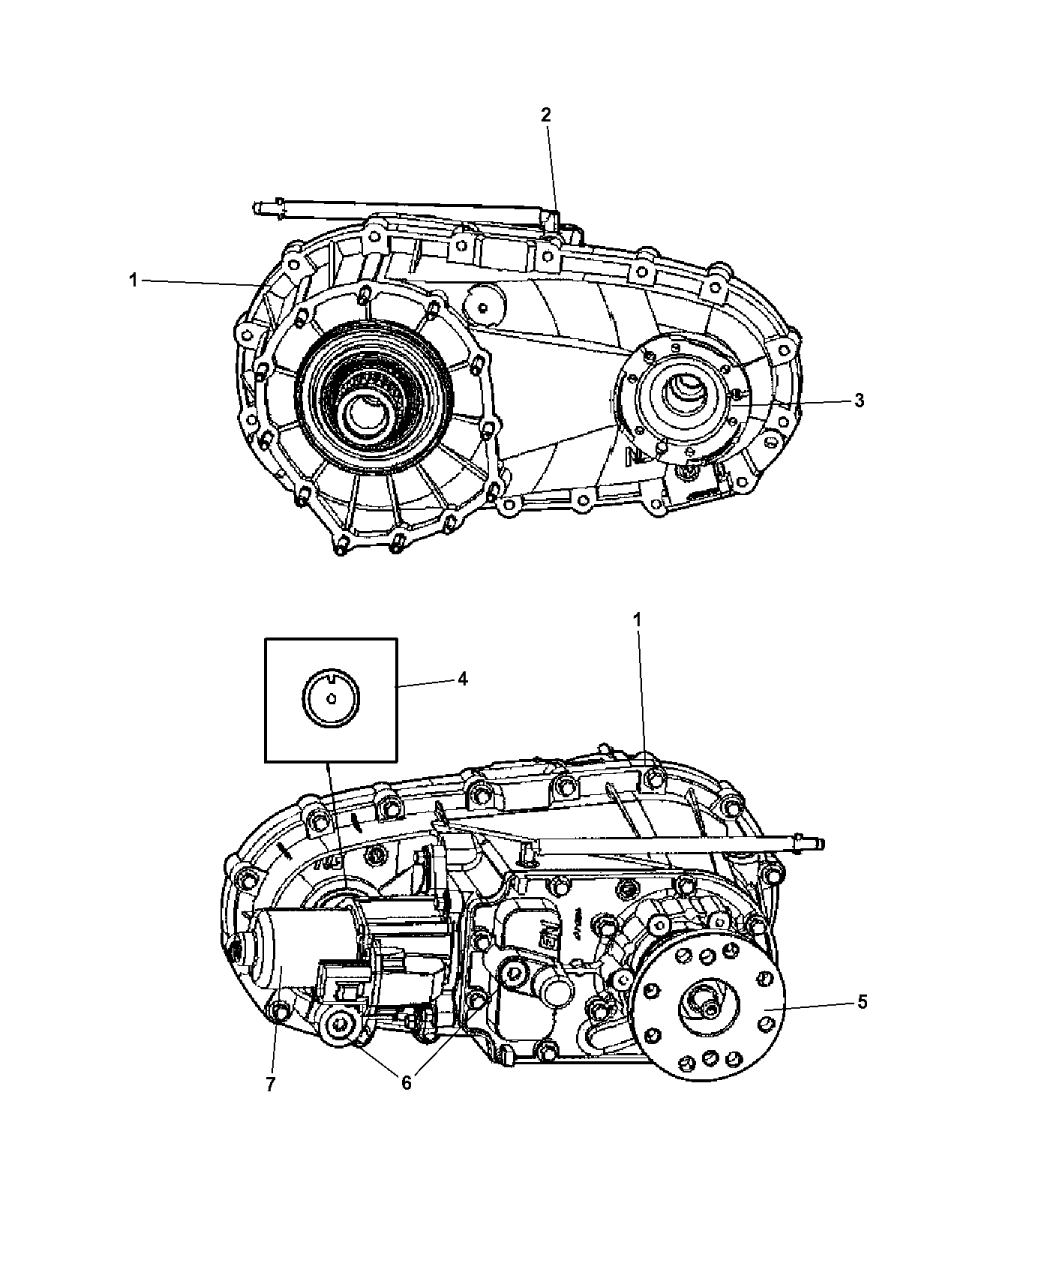 2008 Jeep Commander Transfer Case Assembly & Identification